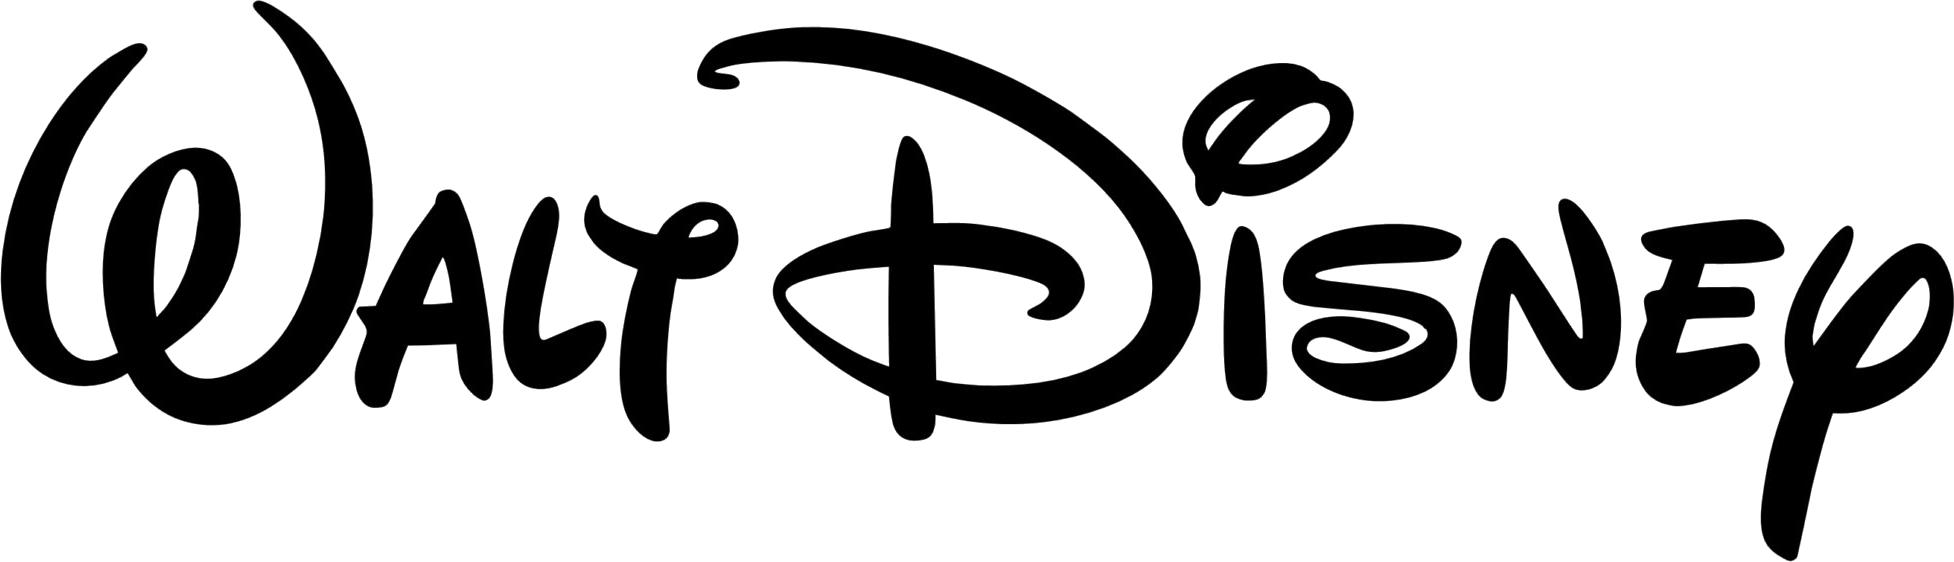 Walt Disney logo PNG images free download.